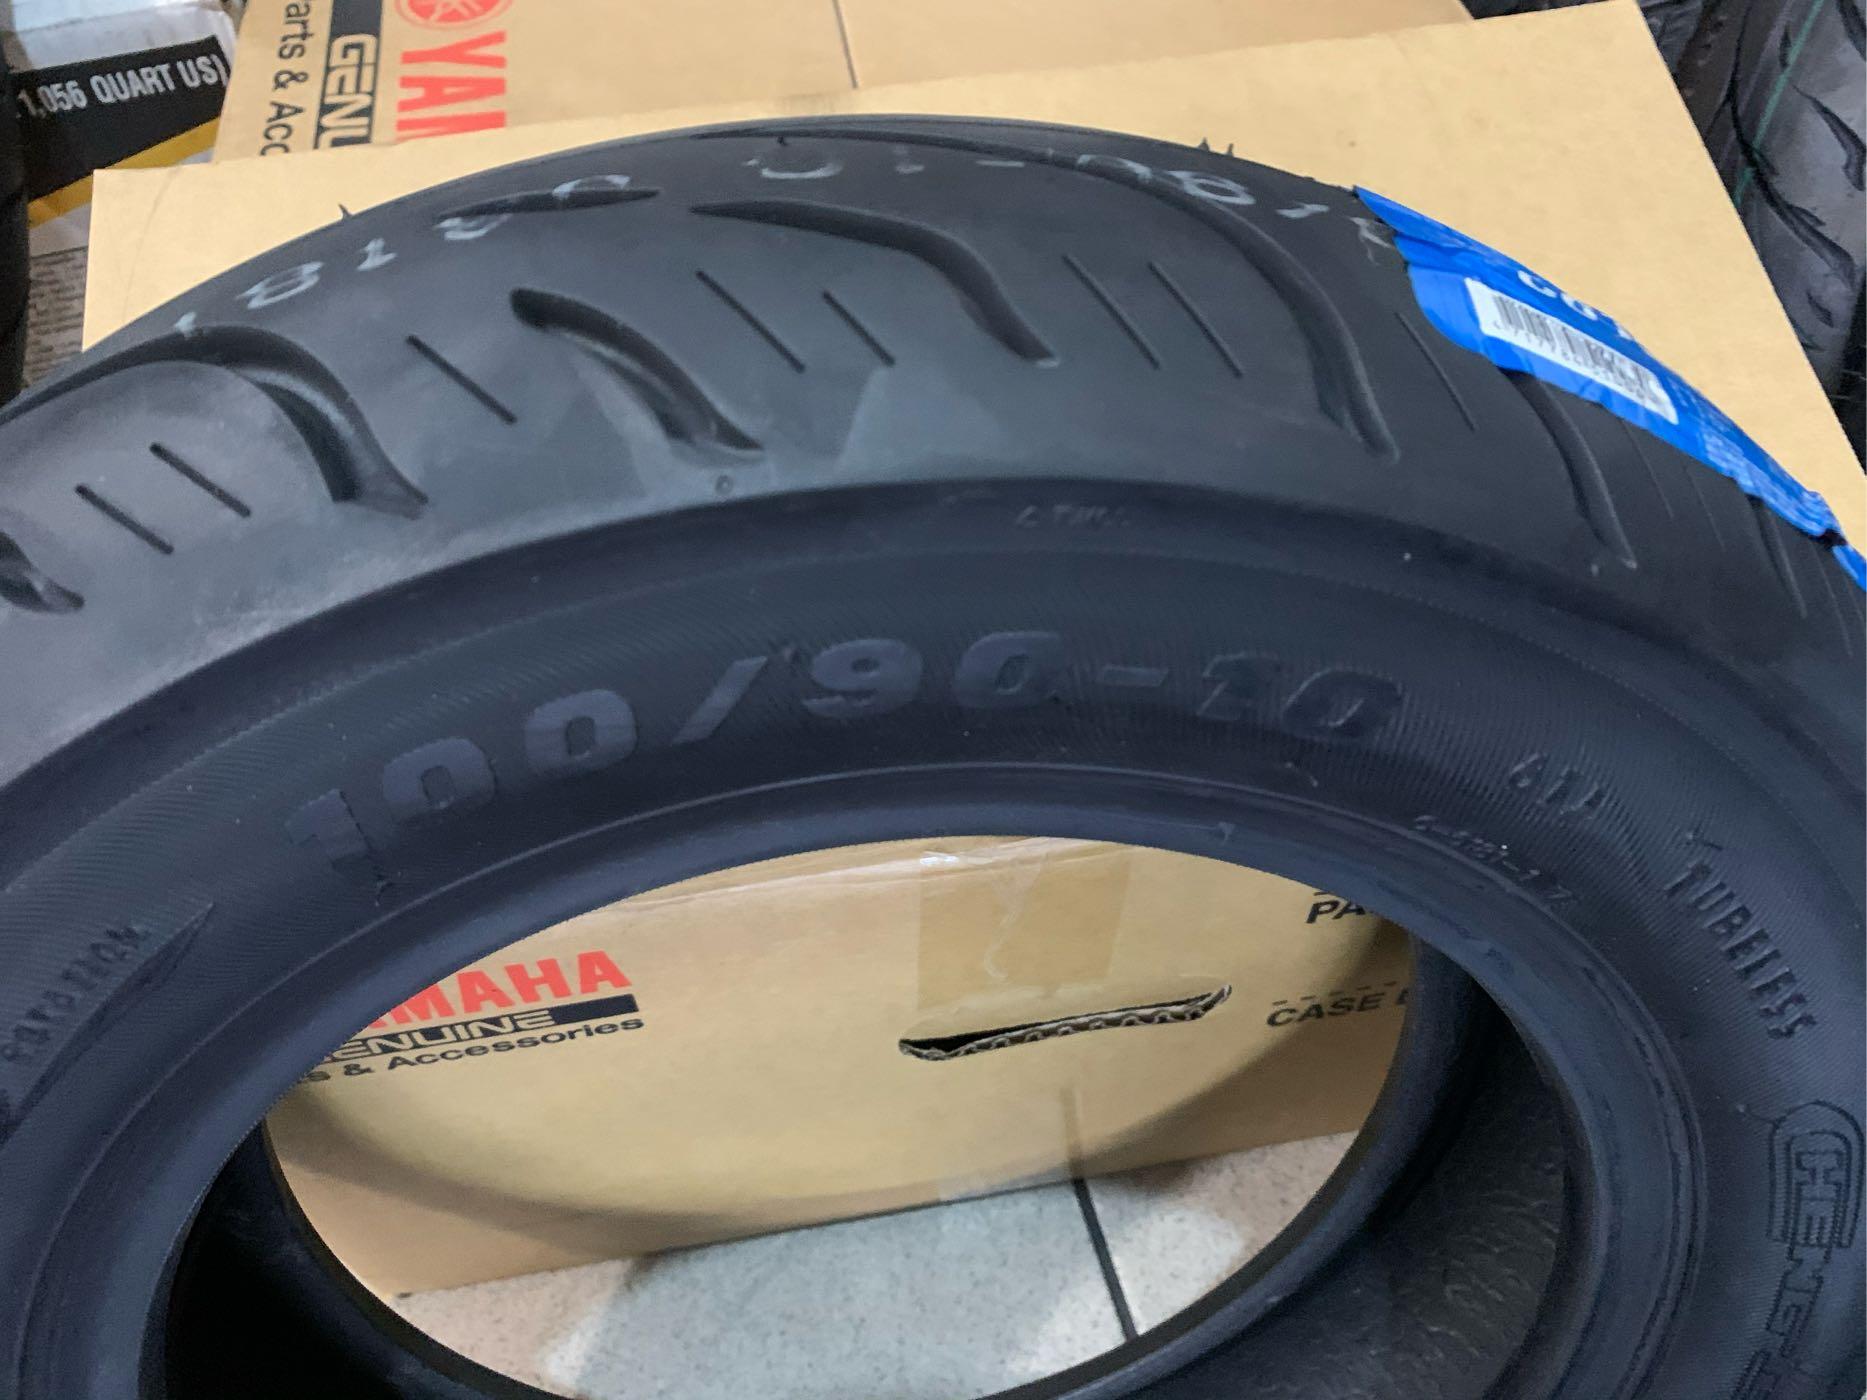 CST 正新 C6181 鋭豹 100/90 10 晴雨胎 機車輪胎